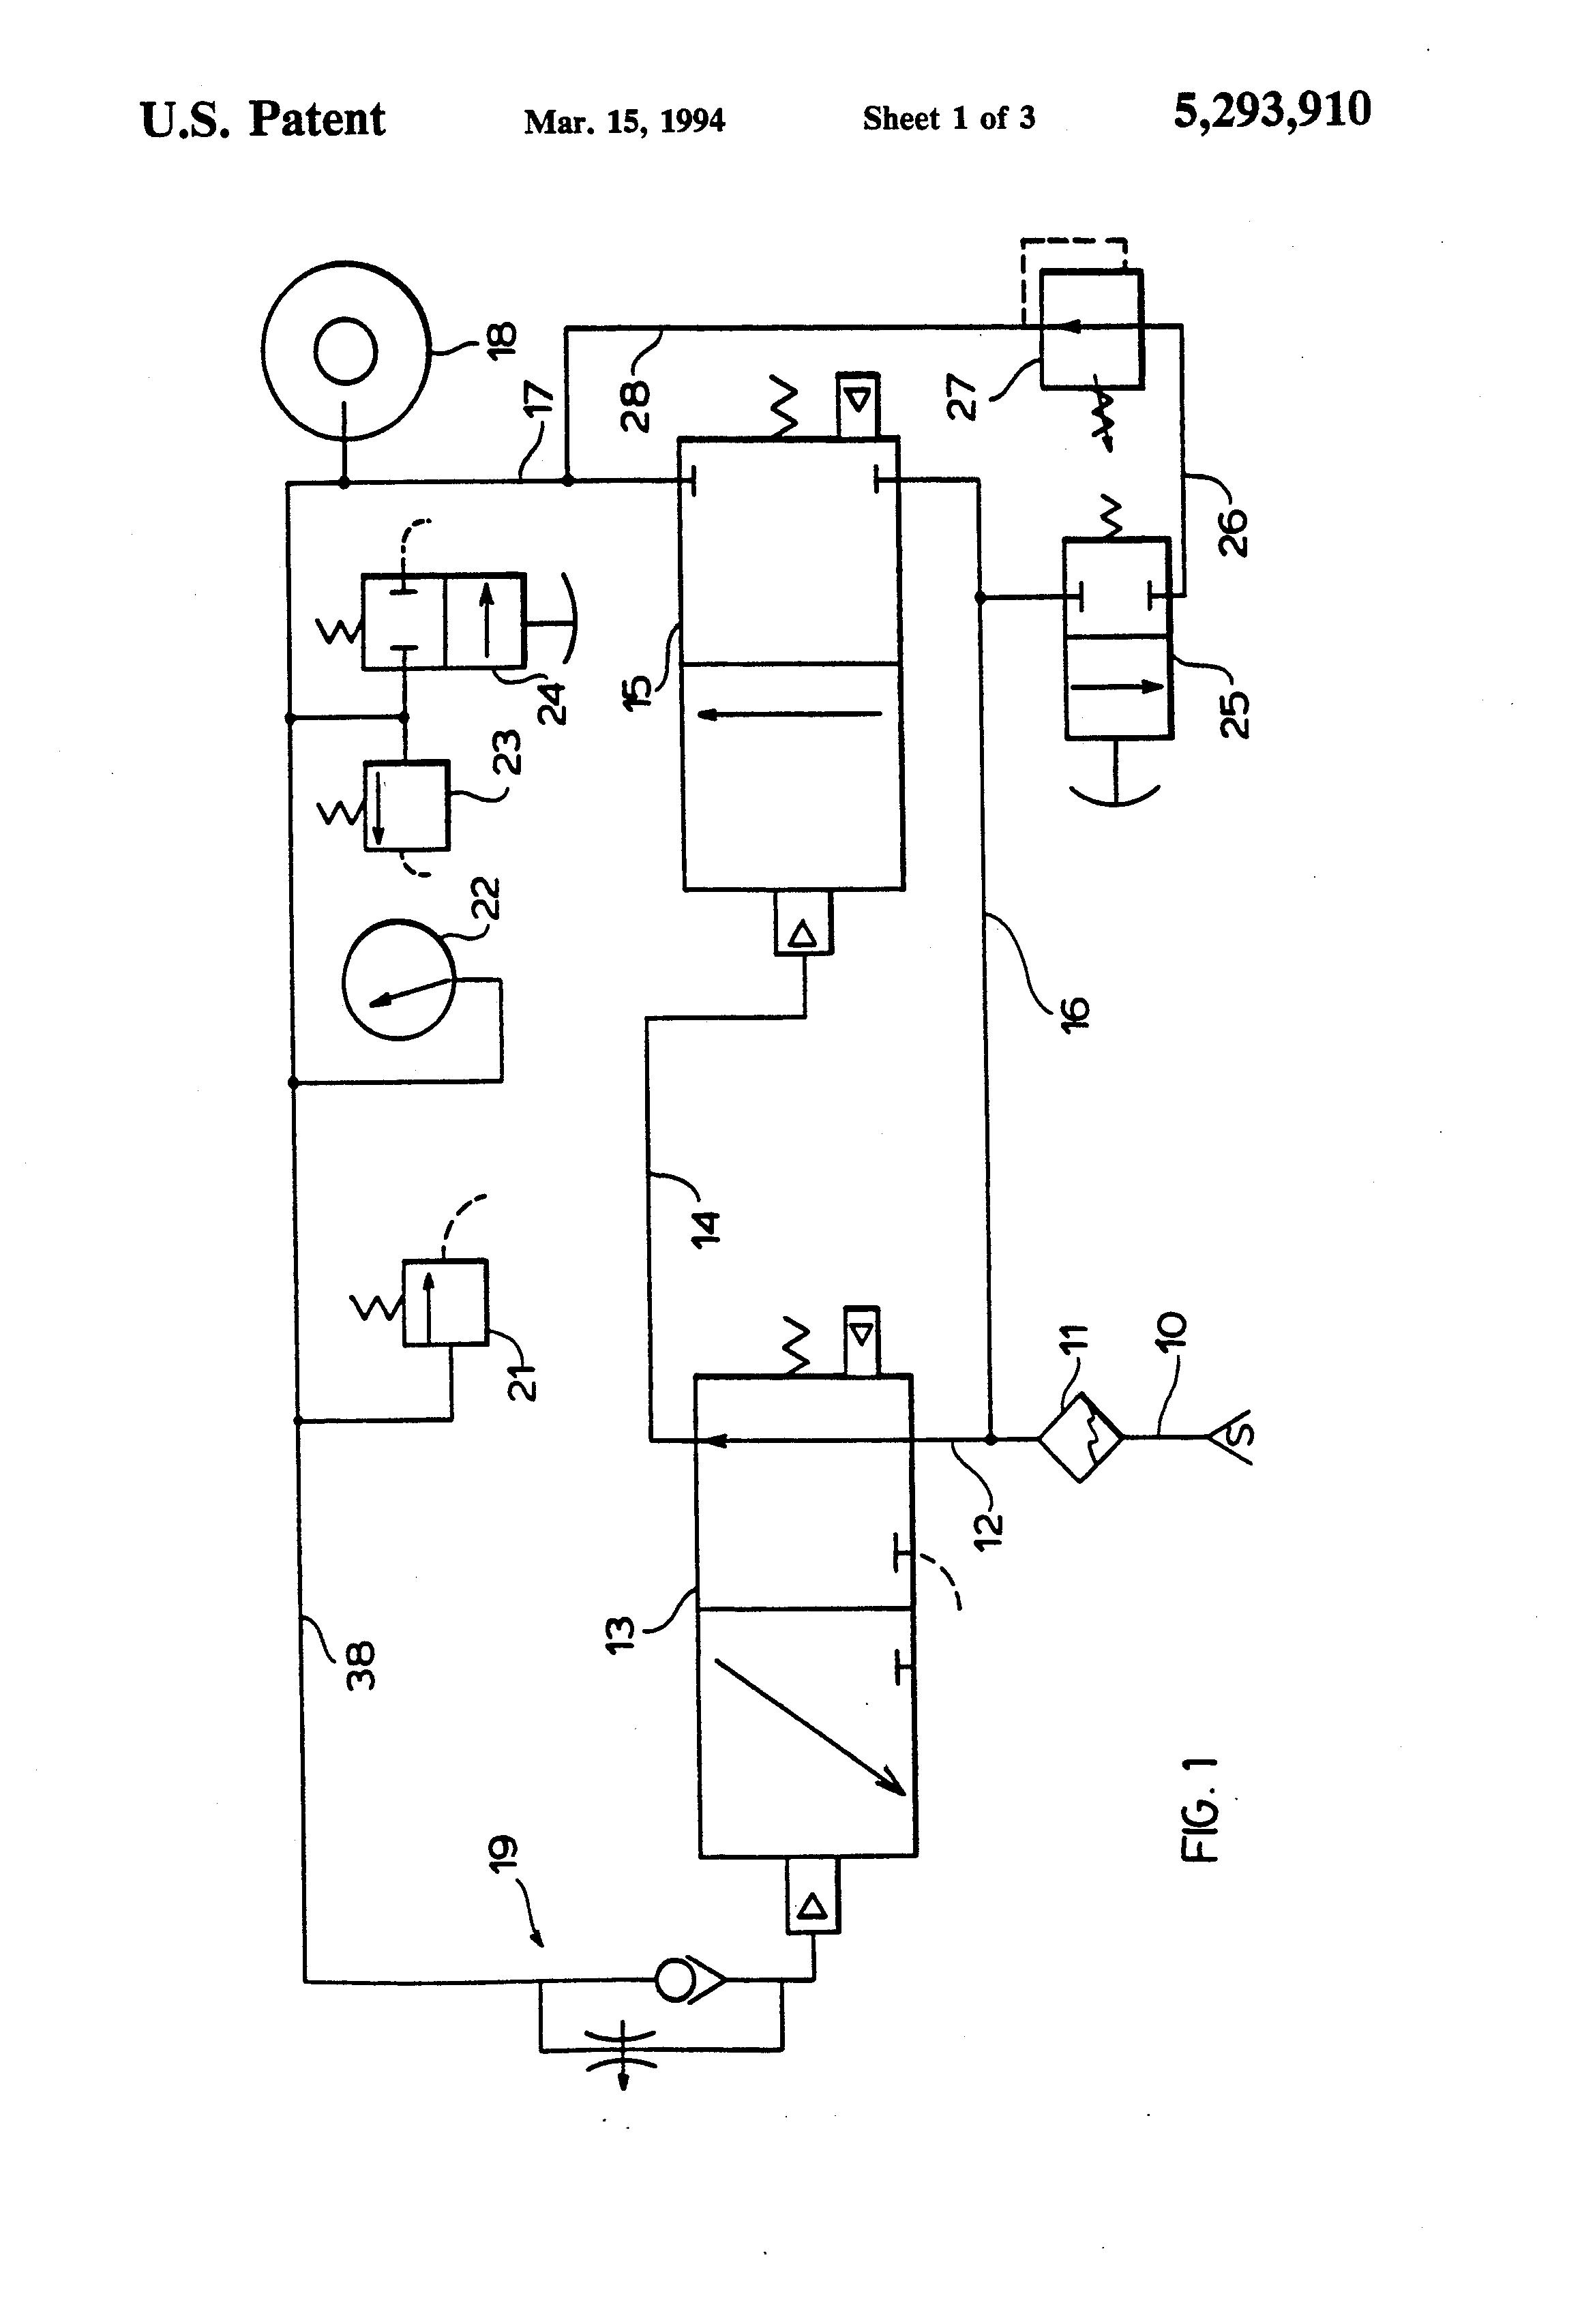 Ansi Standard Electrical Symbols Diagrams Wiring Diagram